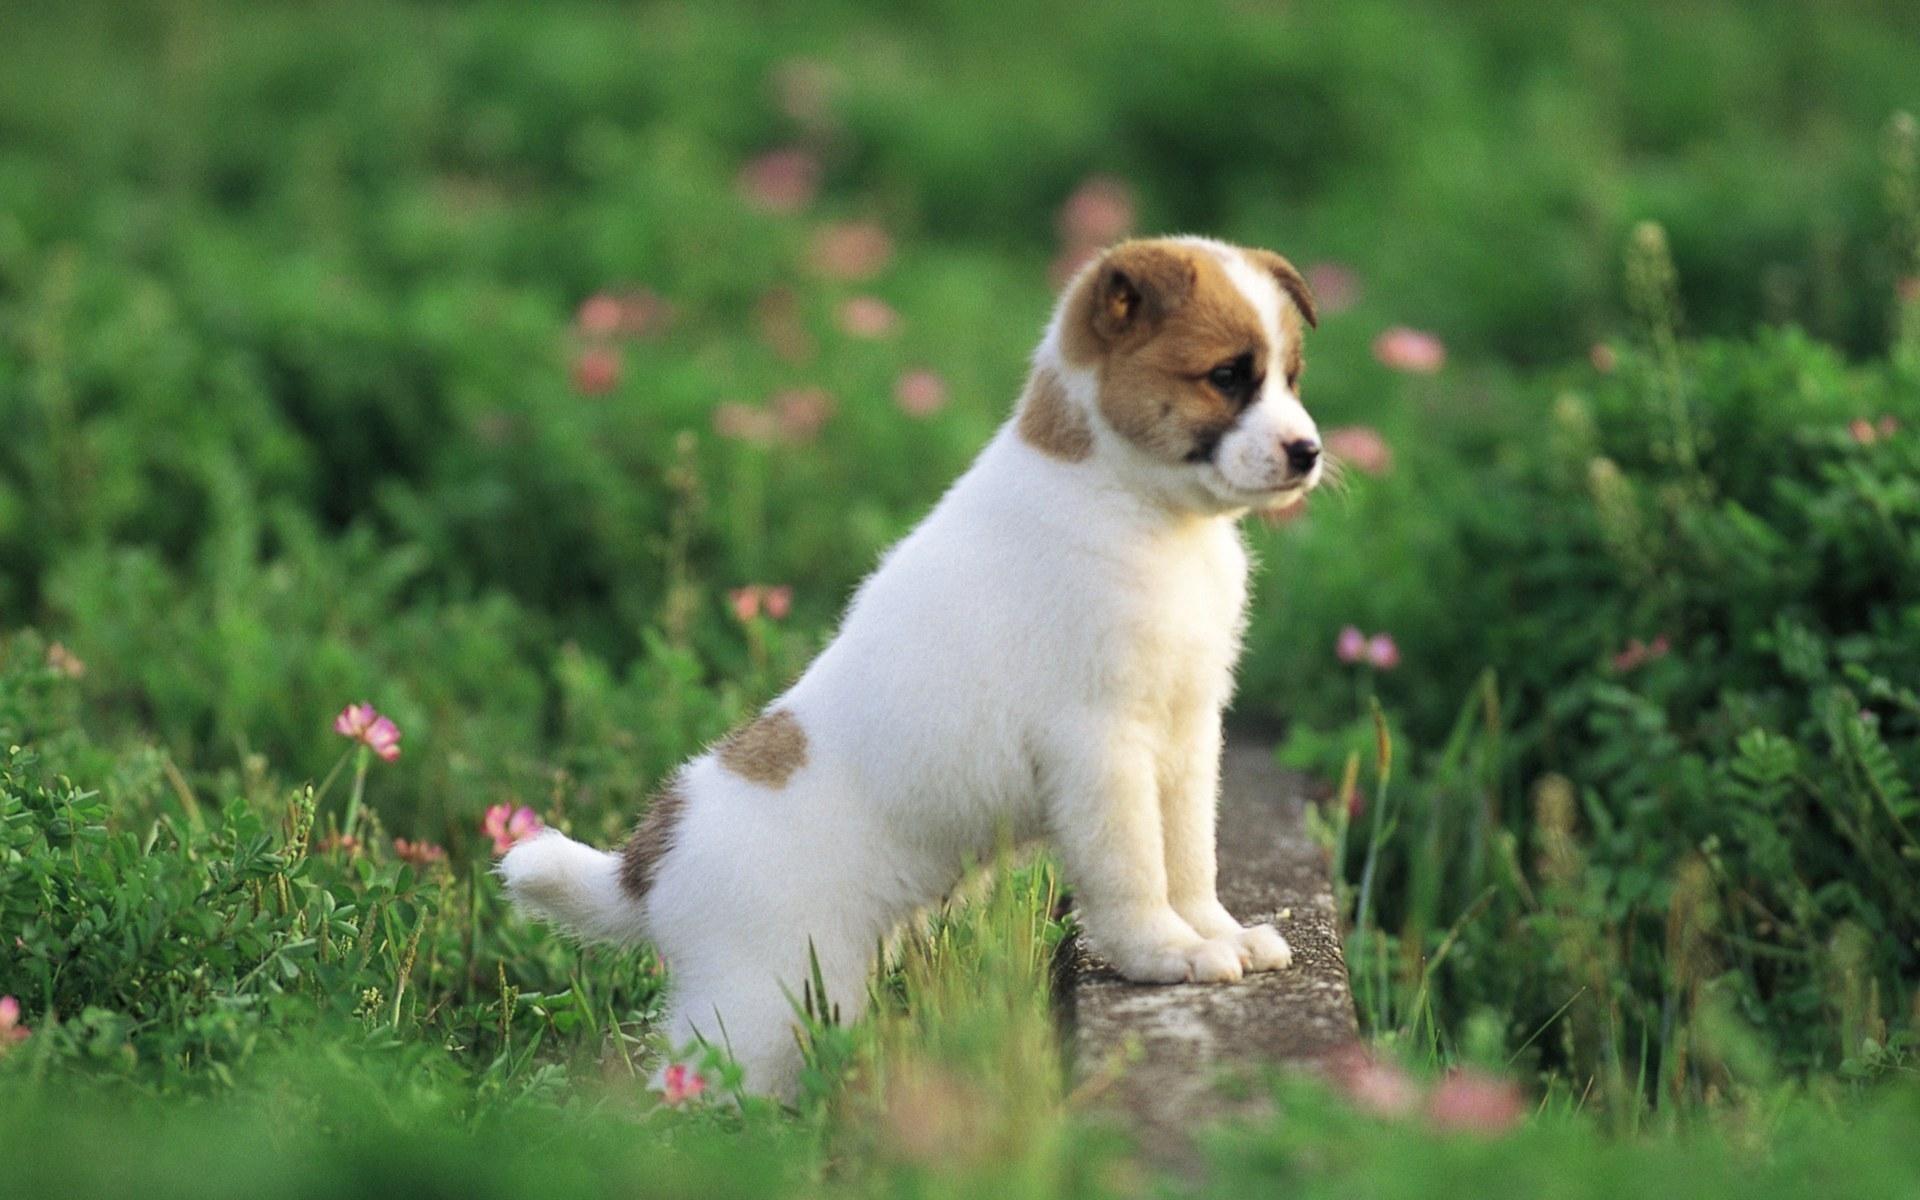 animals Cute Dog hd wallpaper HD Wallpapers 1080p